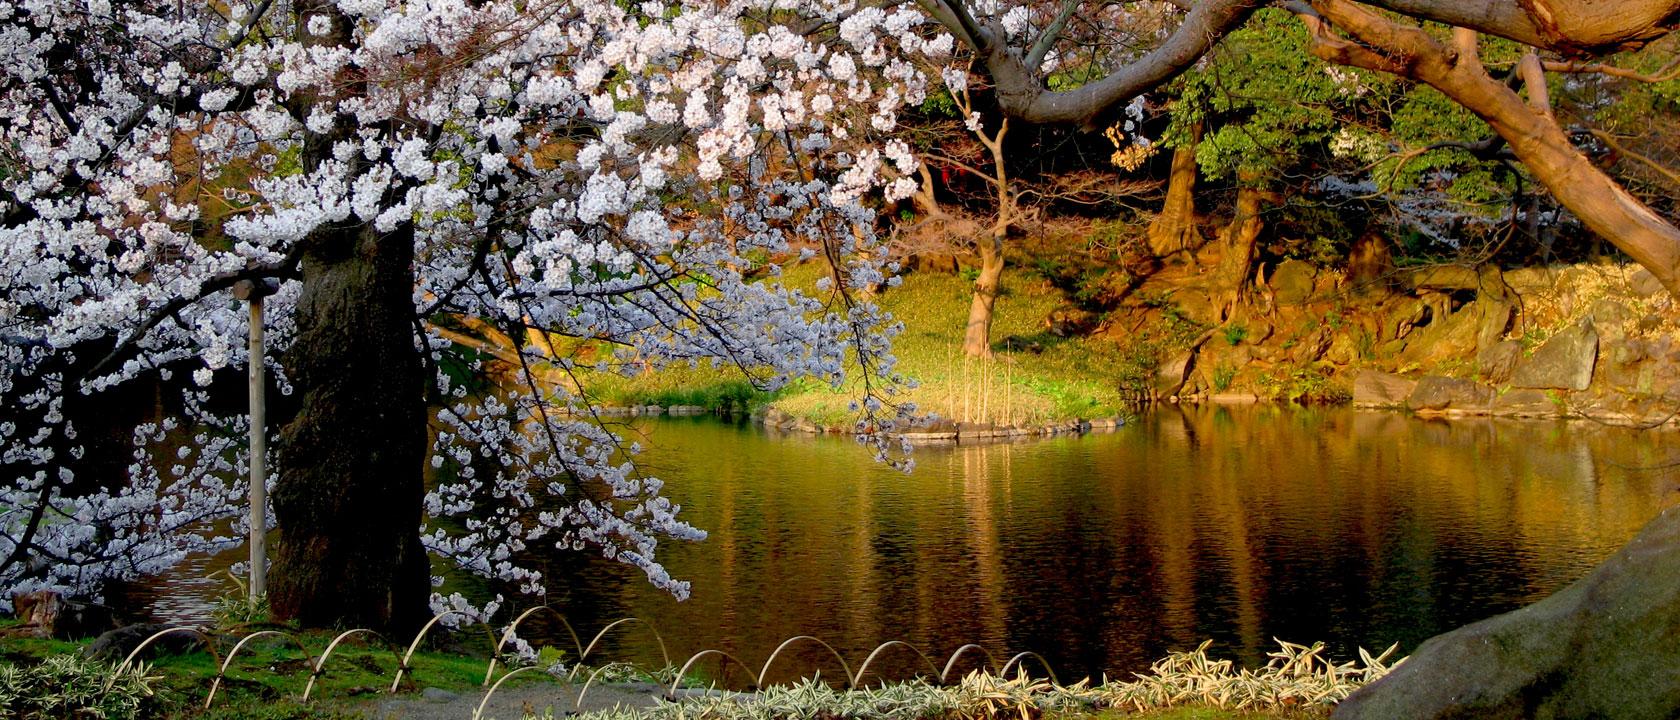 Japanese Garden Cherry Blossom Paintings - Home Design Ideas - http ...